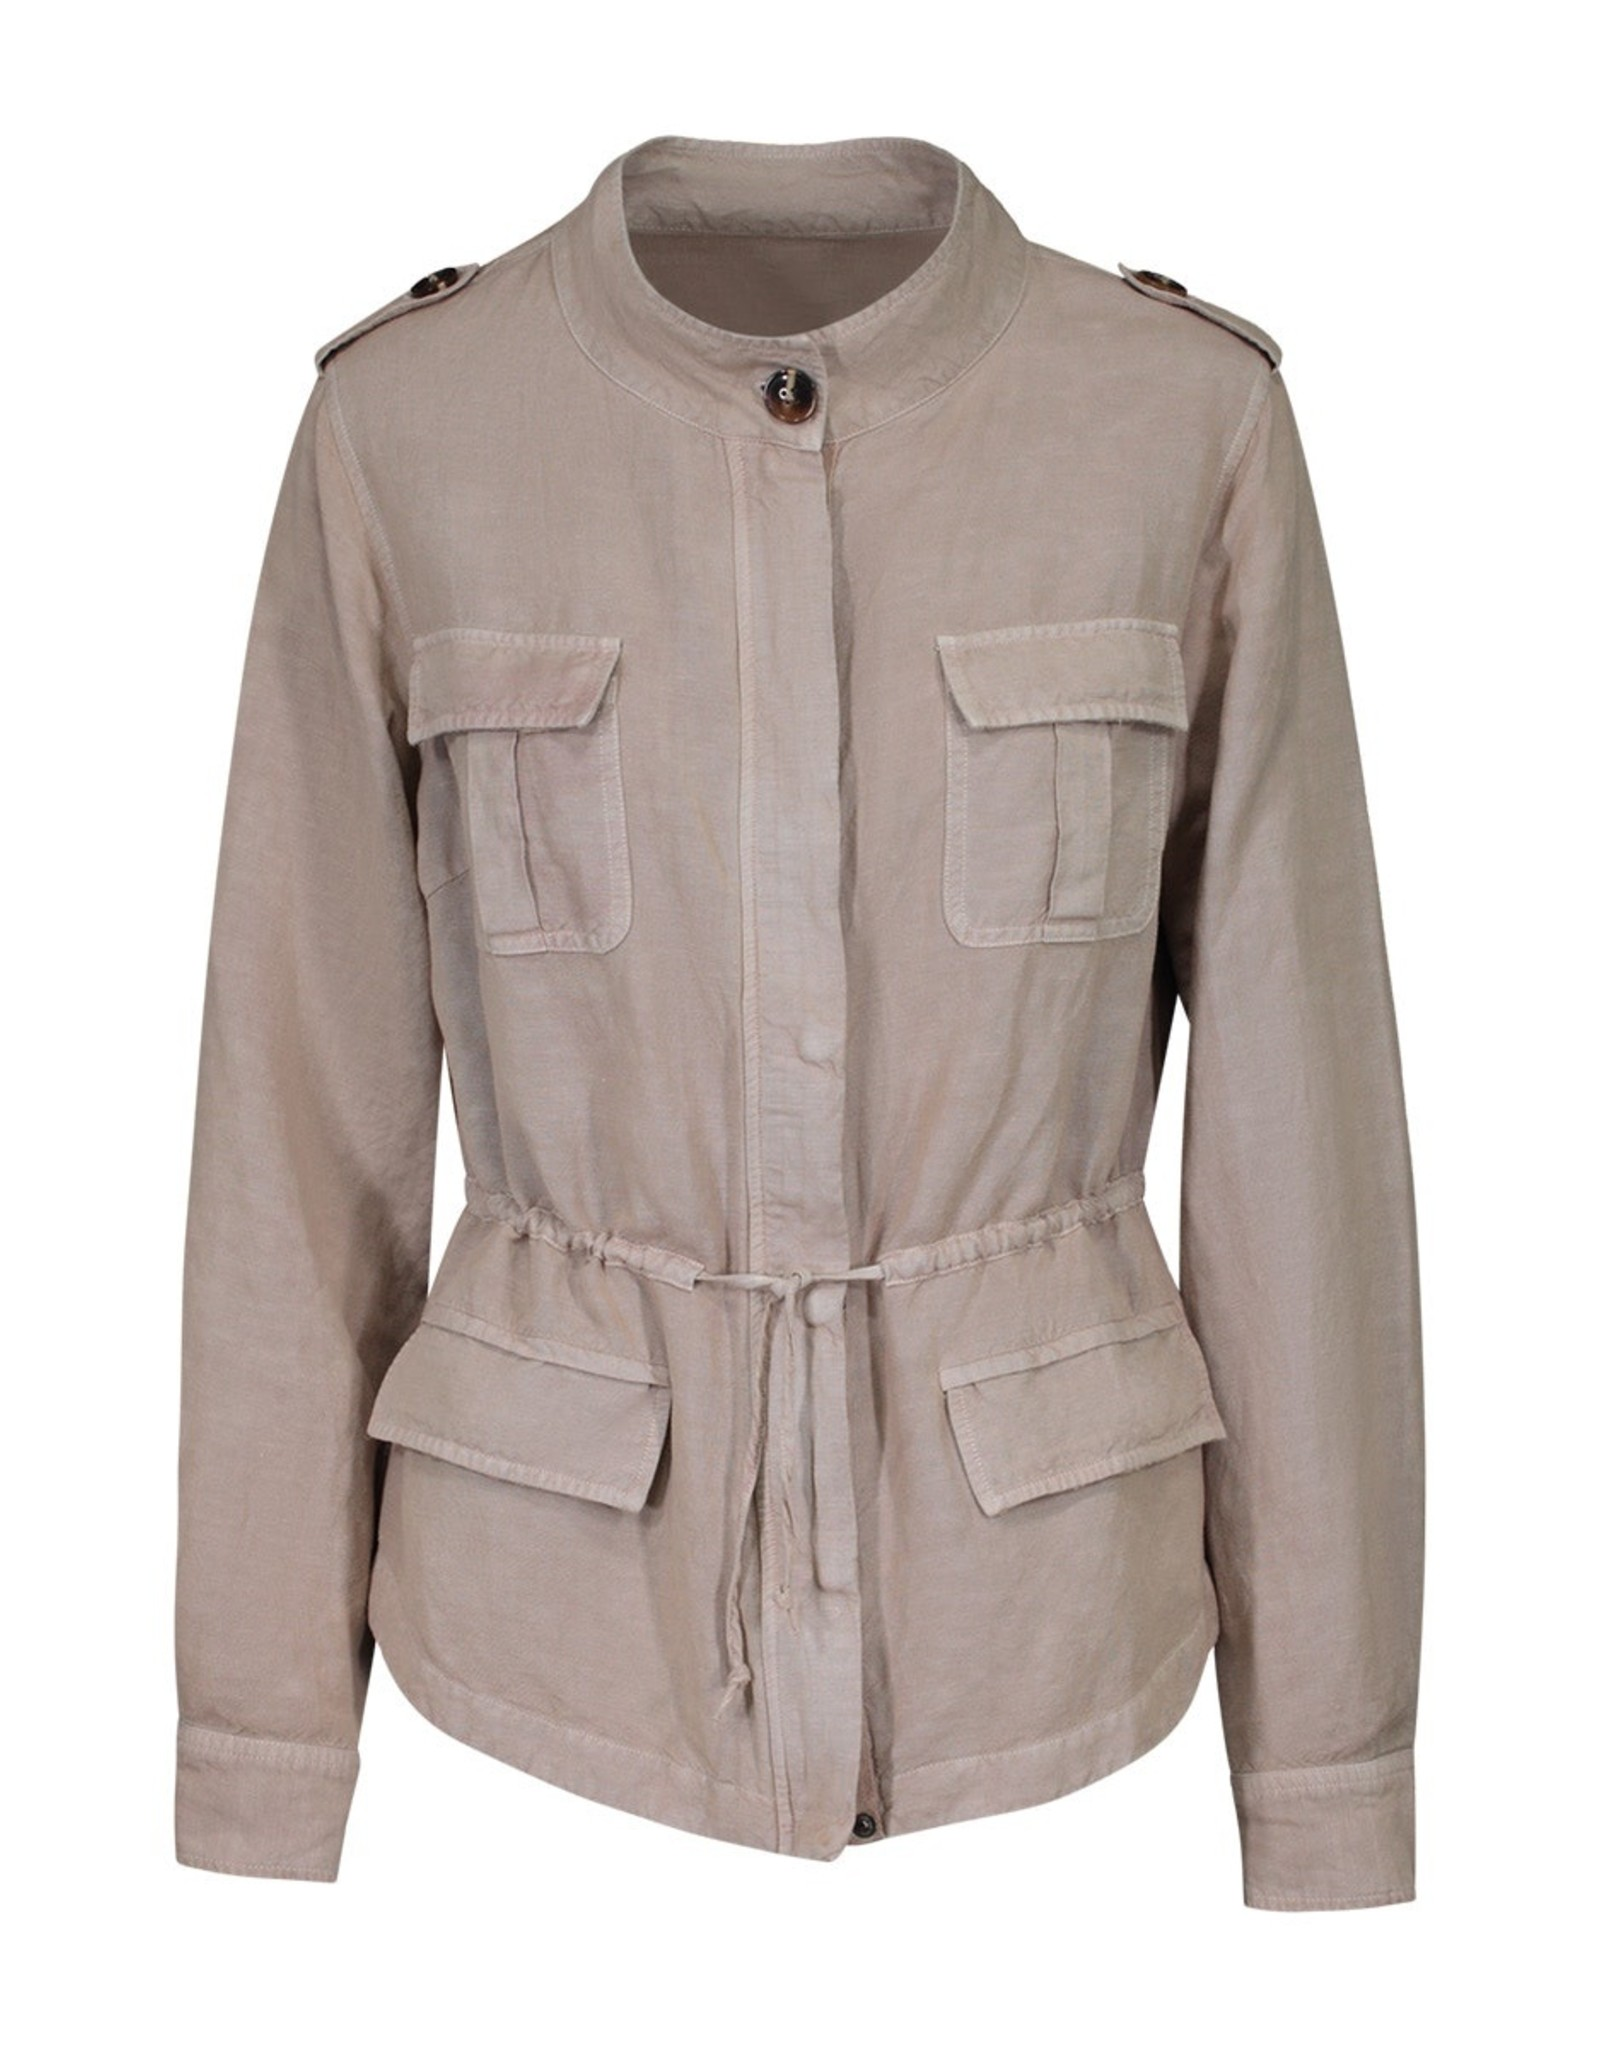 Tribal Utilitary Jacket 69920 (S1)